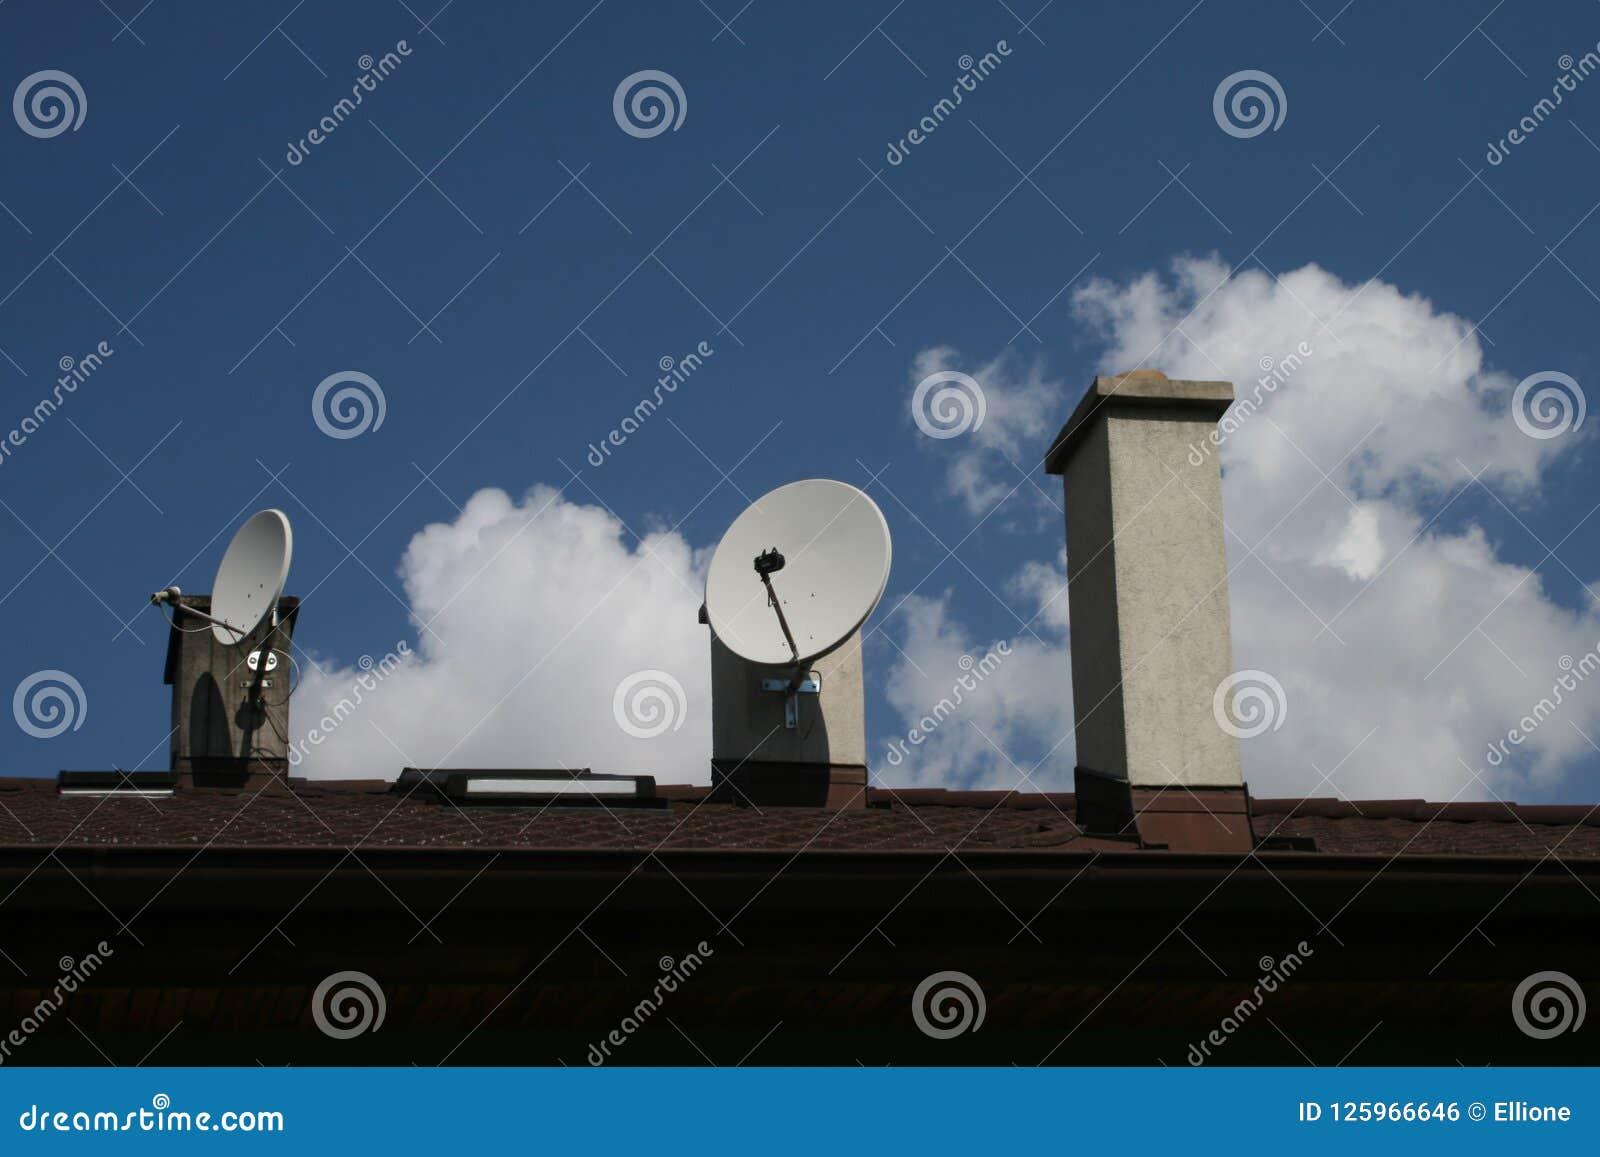 Stacks with satellites.